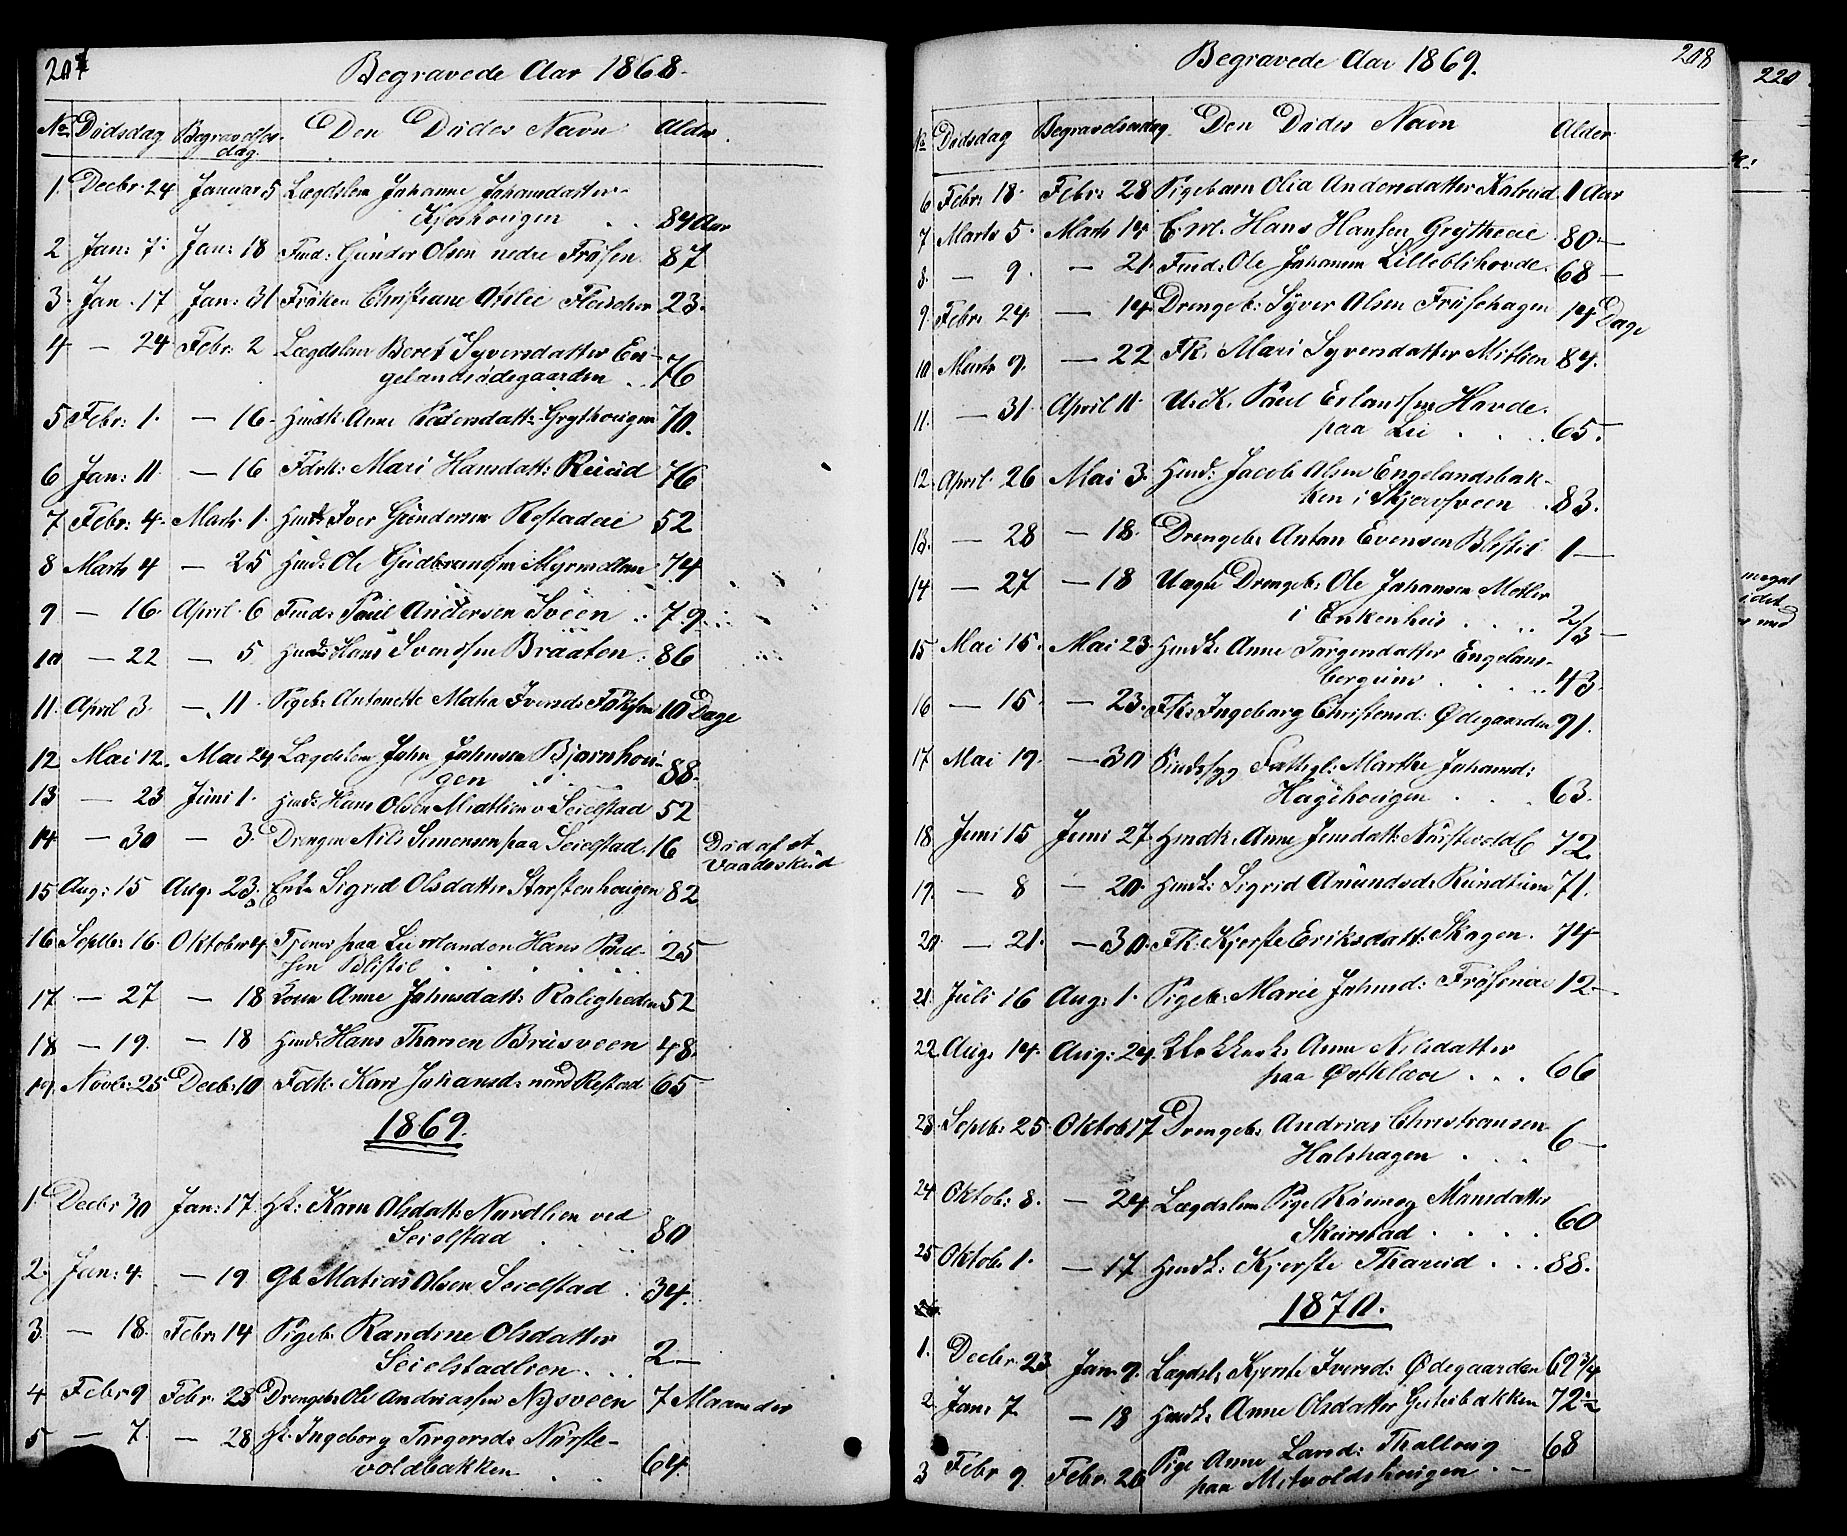 SAH, Østre Gausdal prestekontor, Klokkerbok nr. 1, 1863-1893, s. 207-208